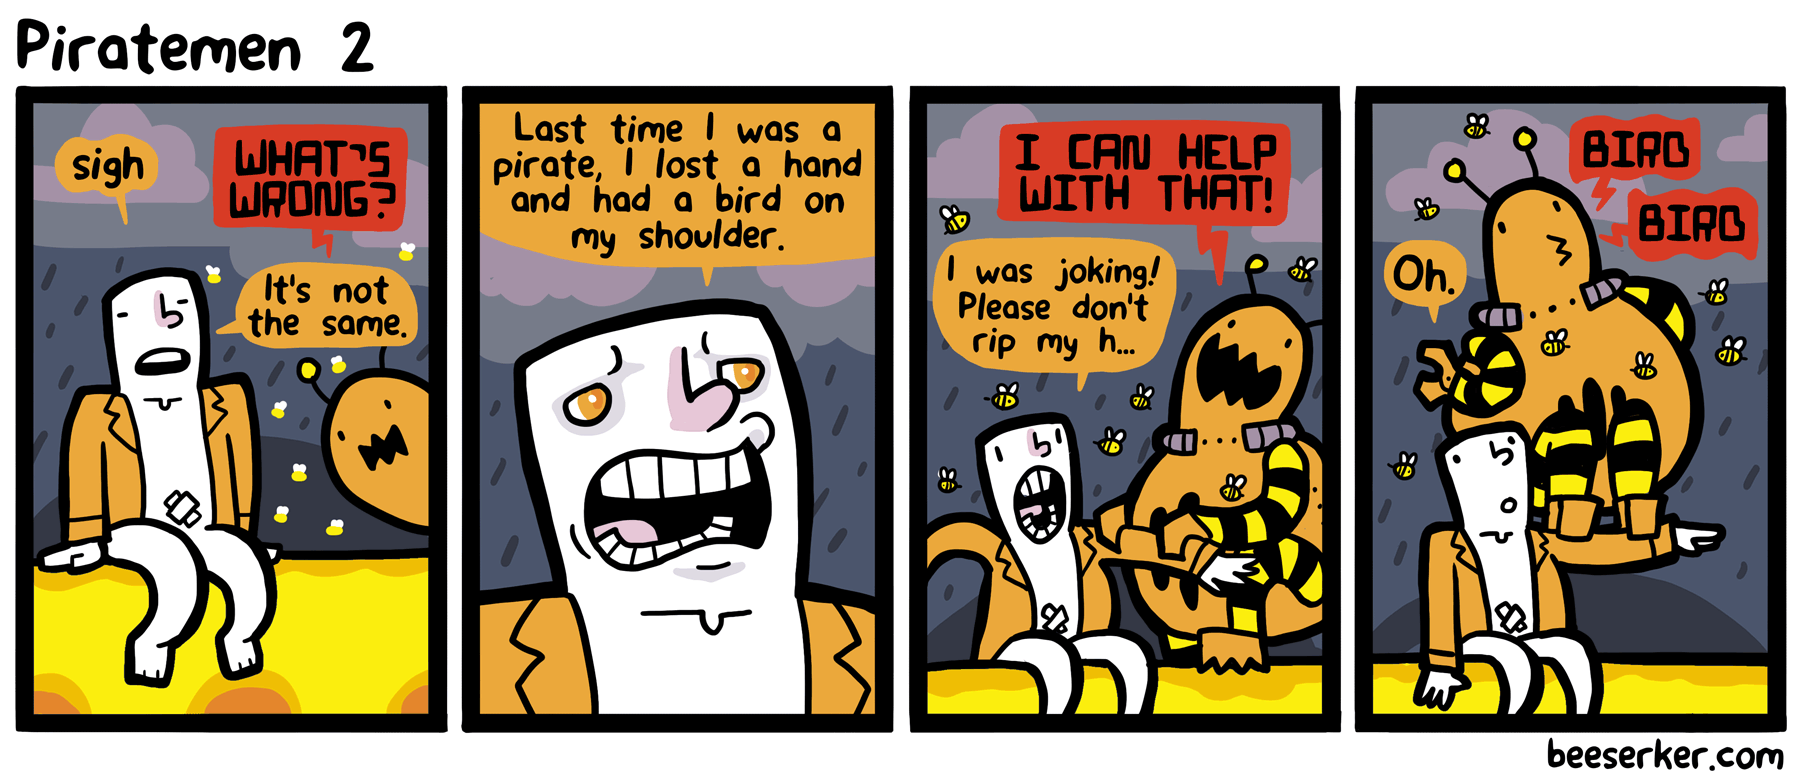 Piratemen 2